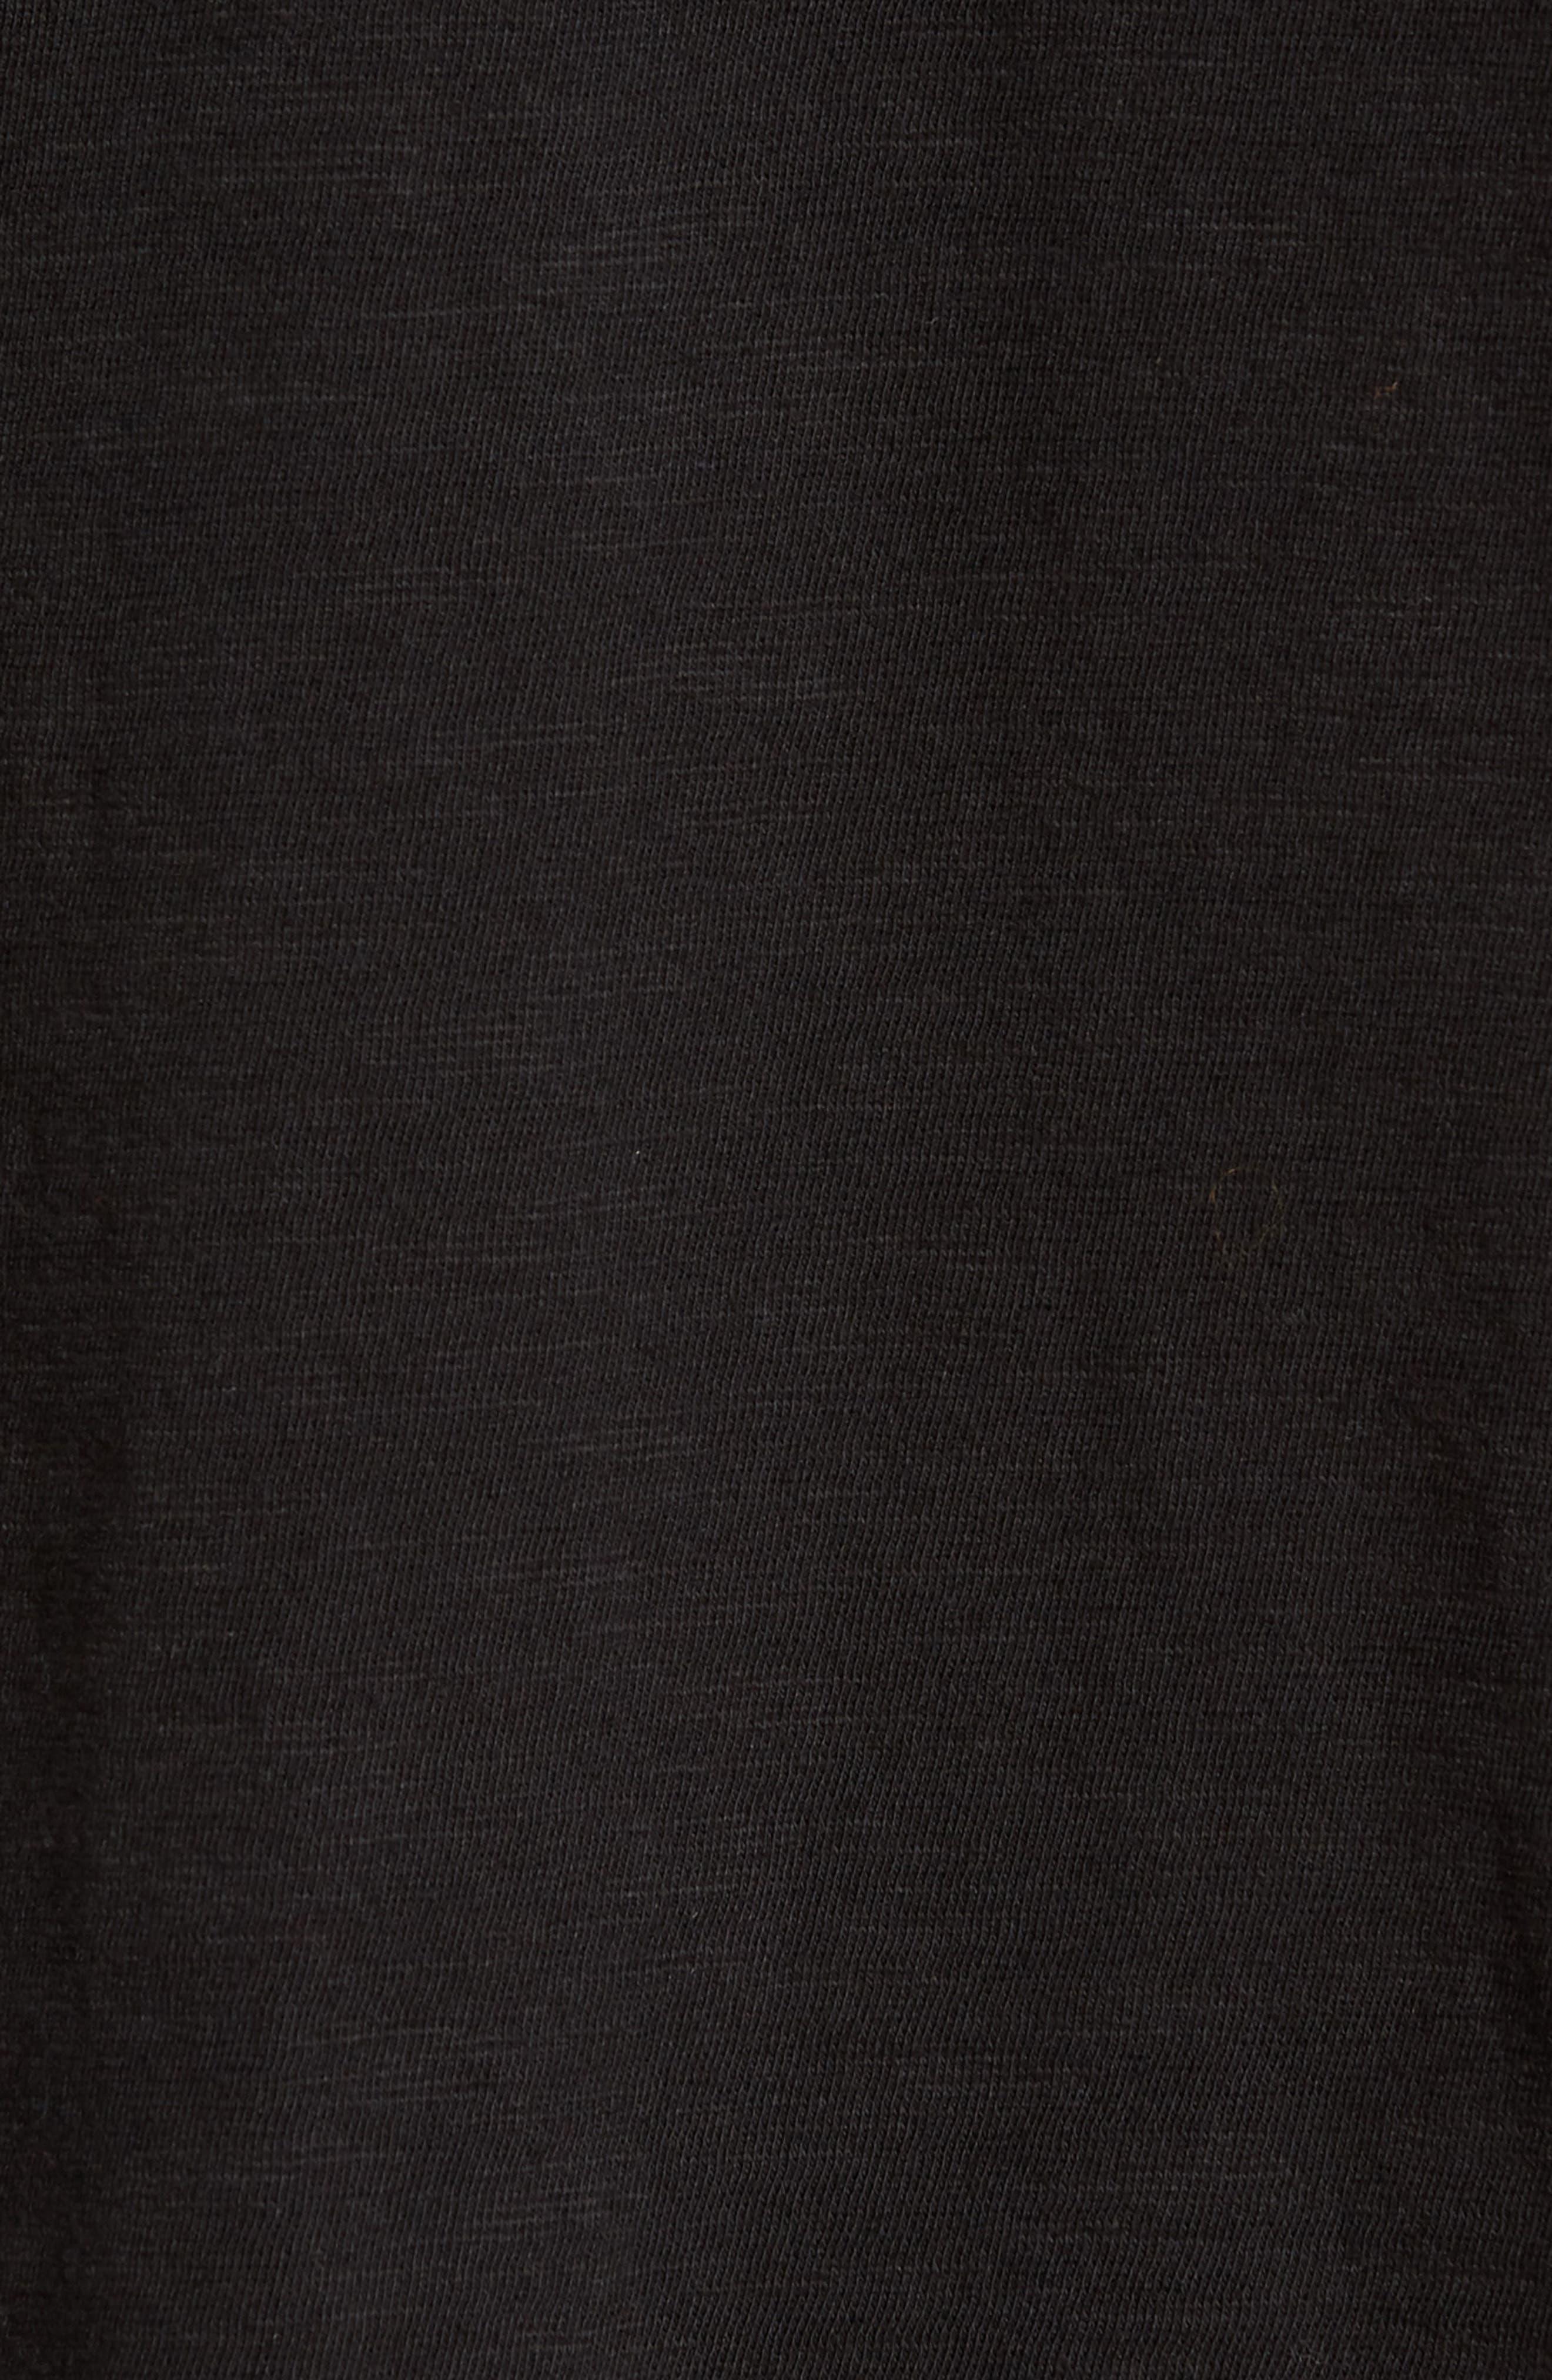 Grit Scrum San Francisco Giants T-Shirt,                             Alternate thumbnail 5, color,                             Jet Black